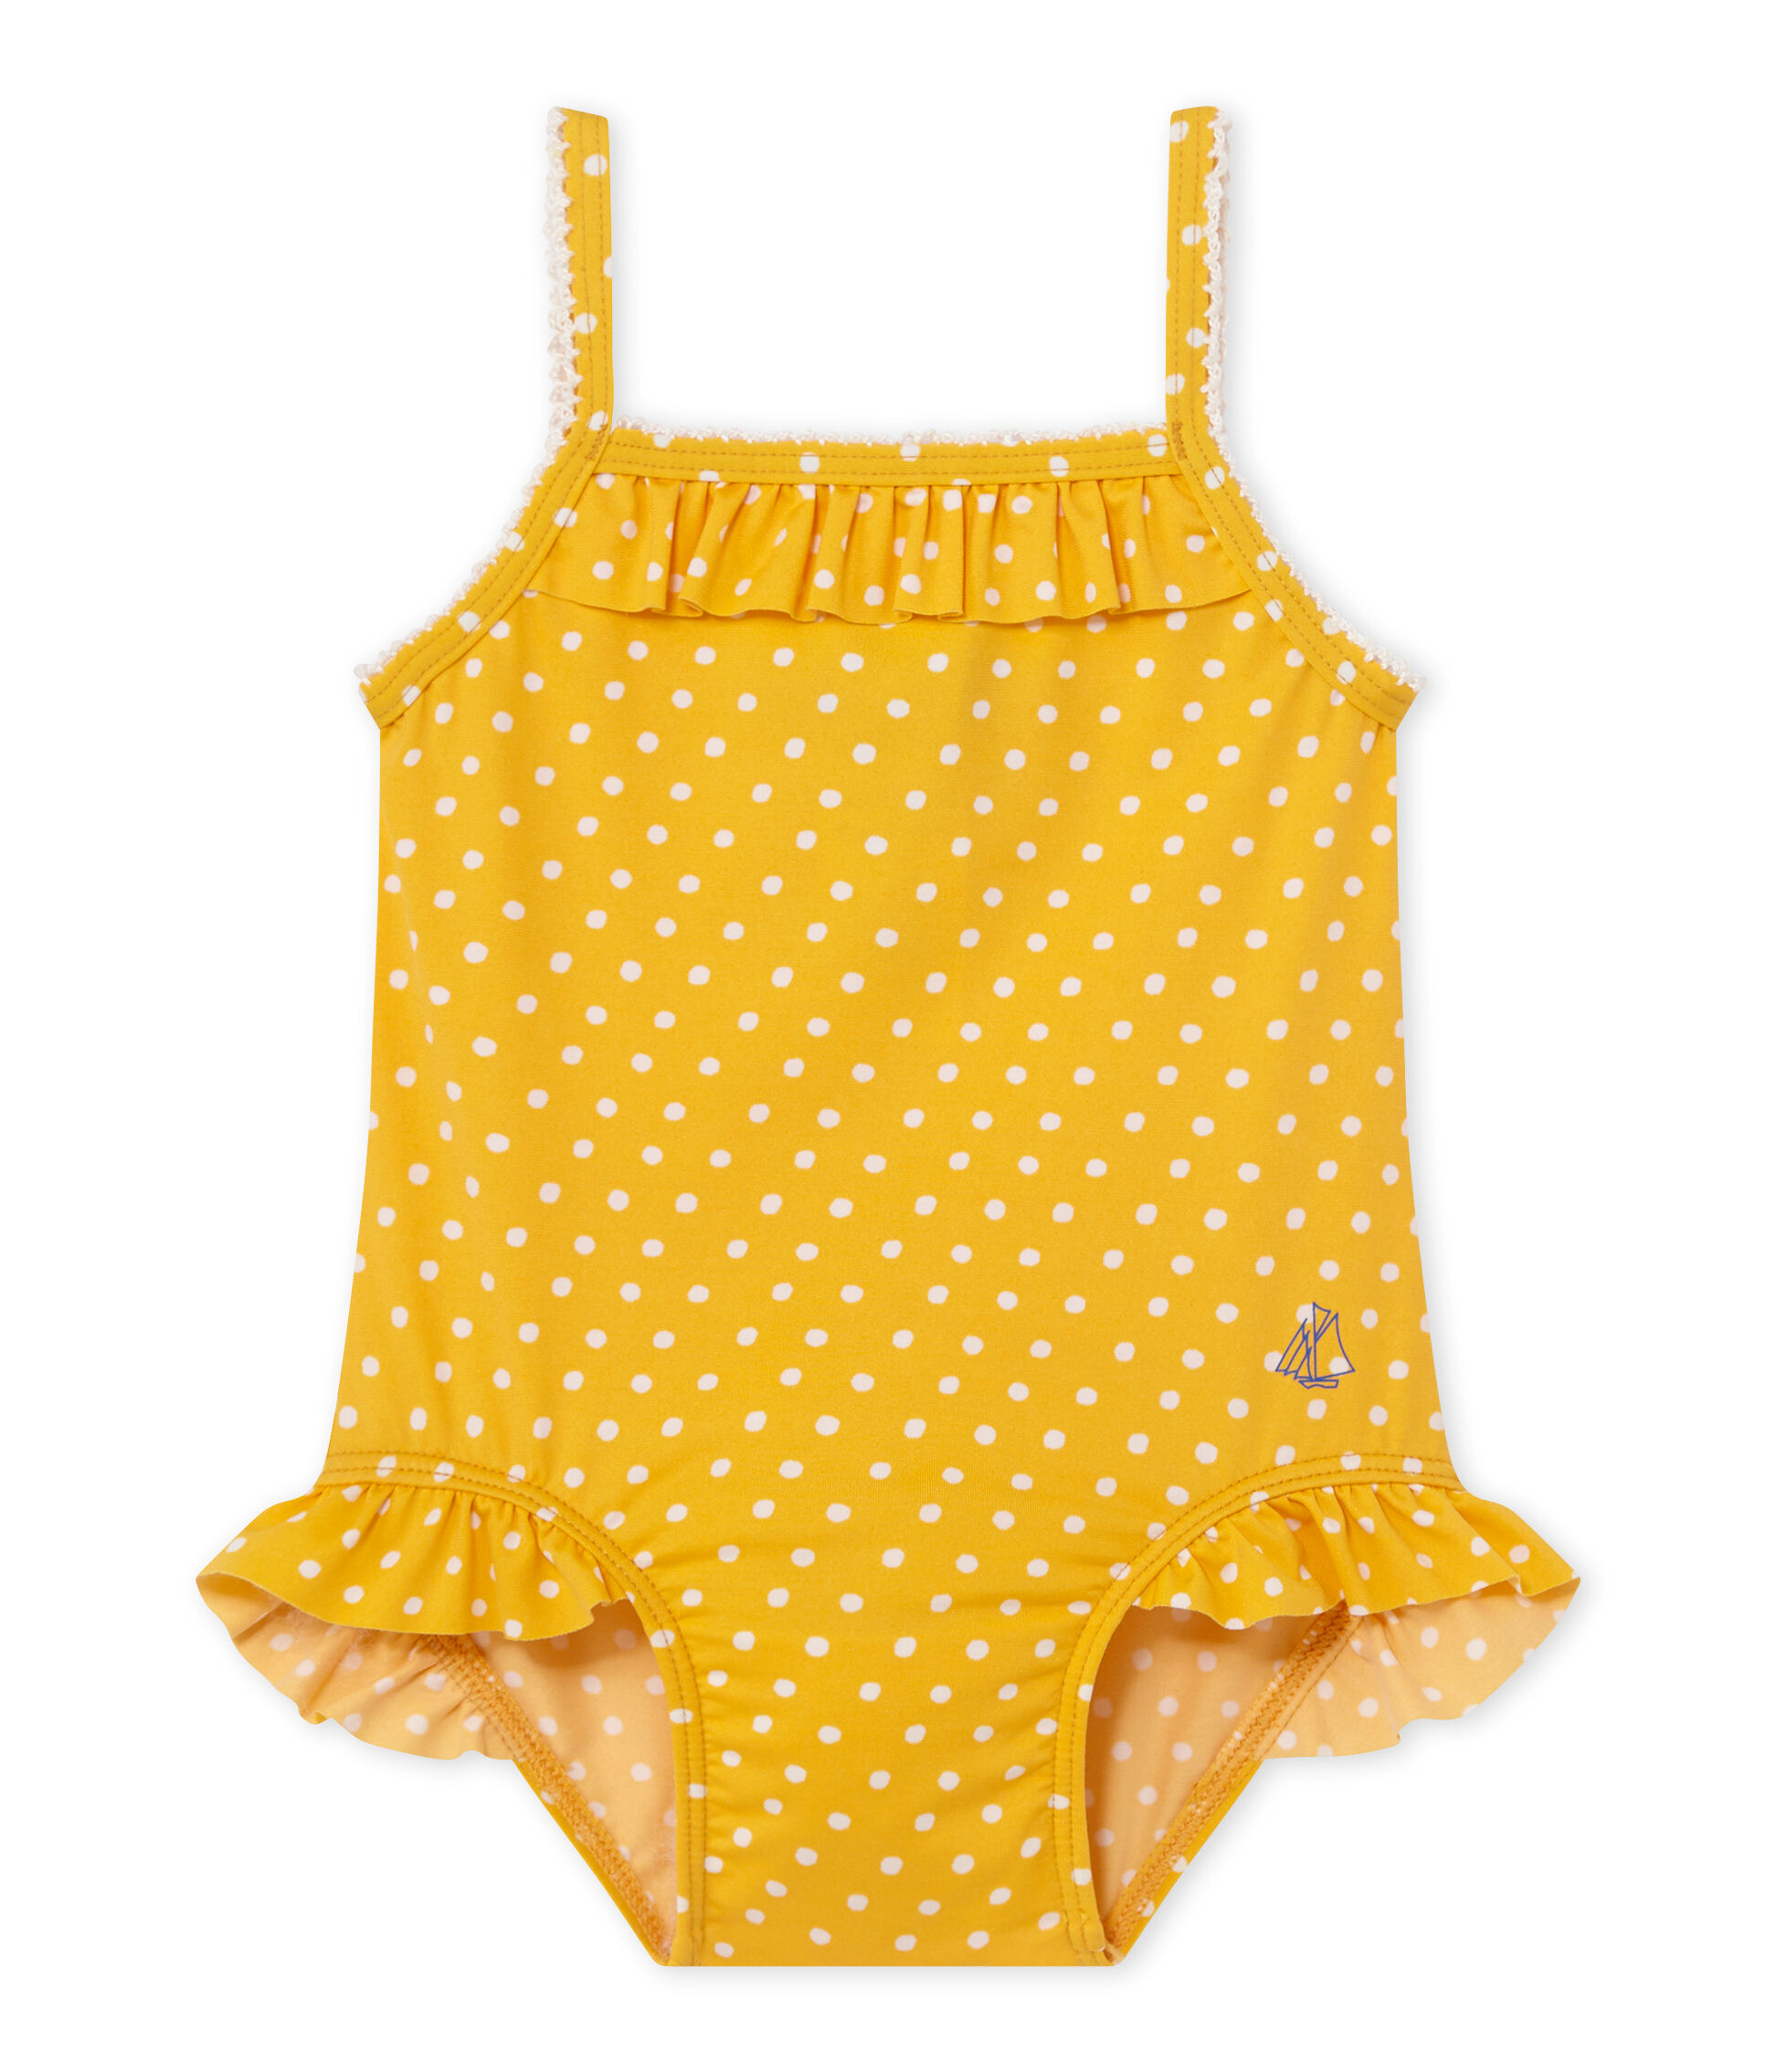 Petit Bateau Baby-M/ädchen Badeanzug